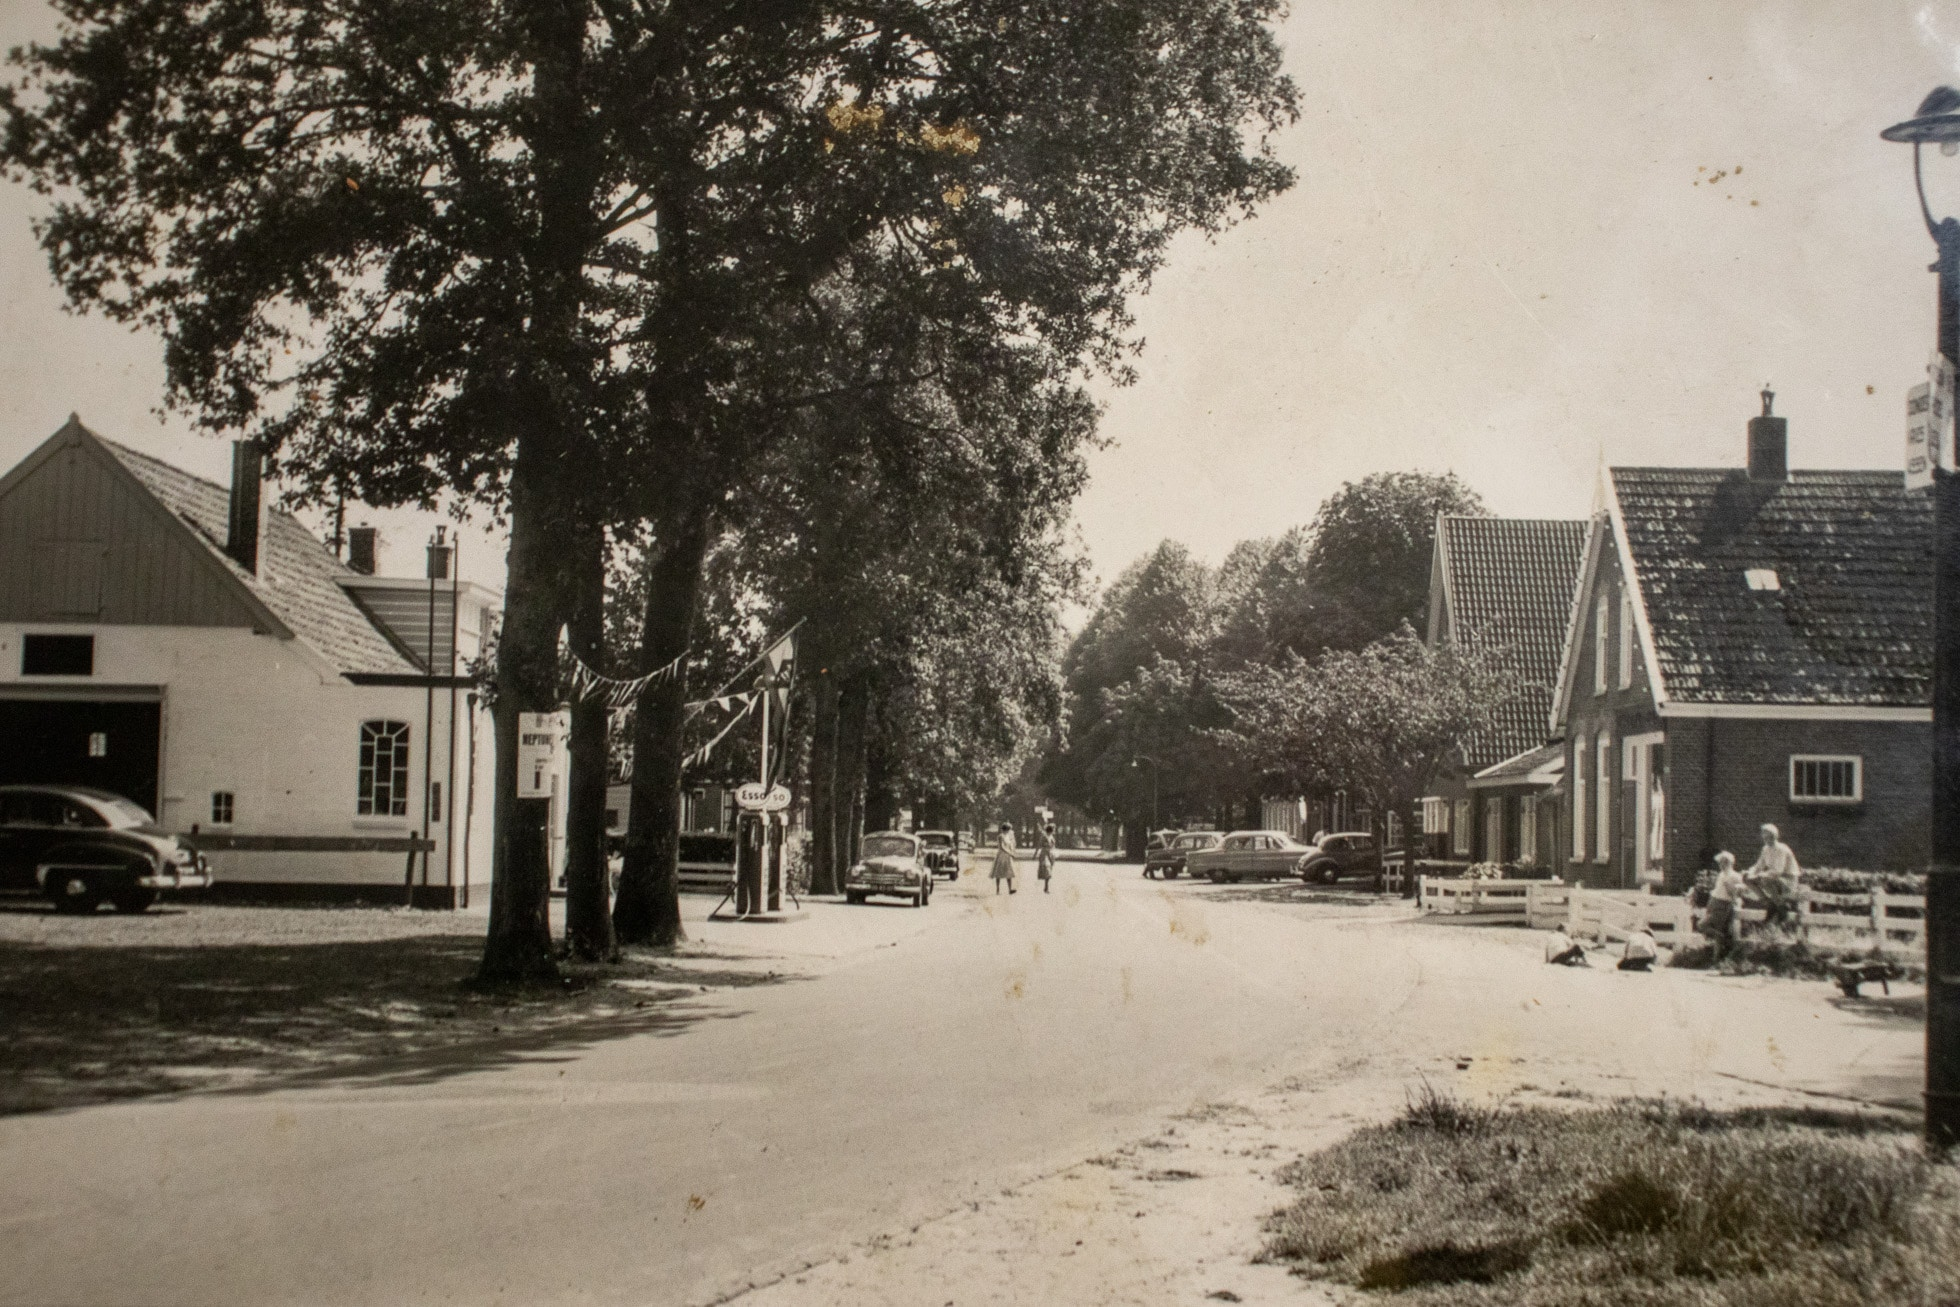 Garage-Dorenbos-Norg-Drenthe-historie-6830